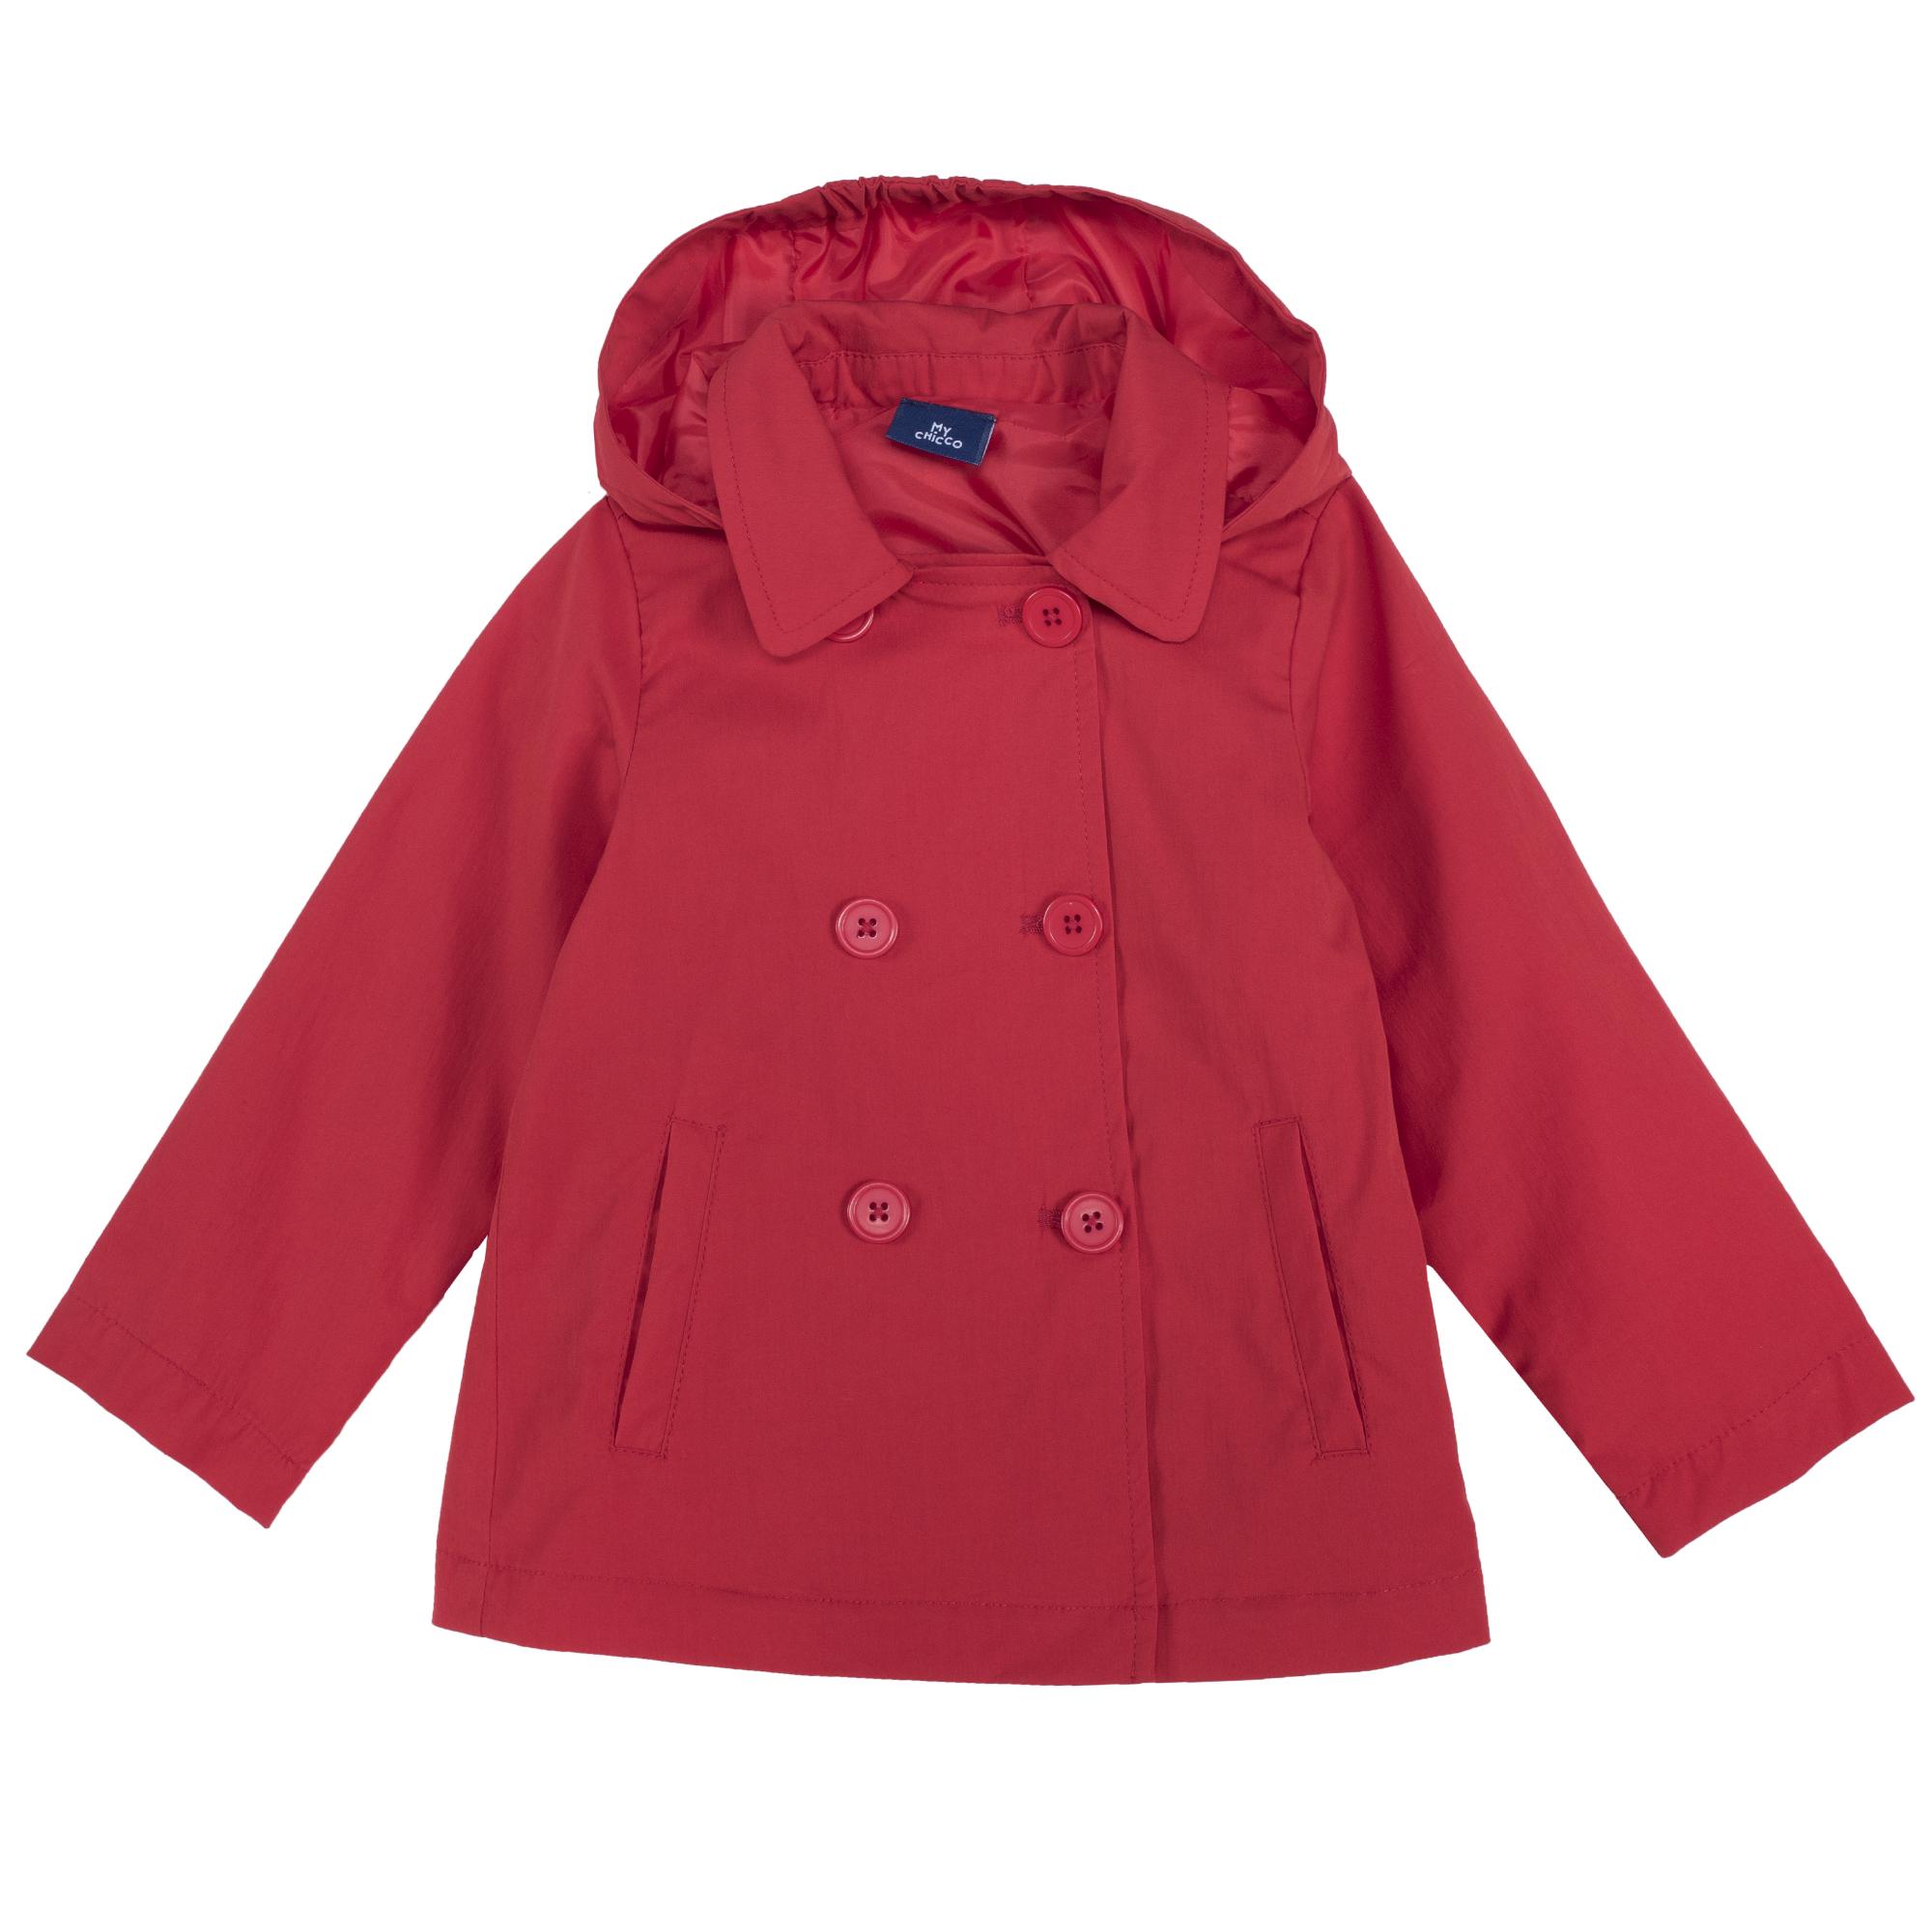 Jacheta copii Chicco, gluga detasabila, rosu, 87401